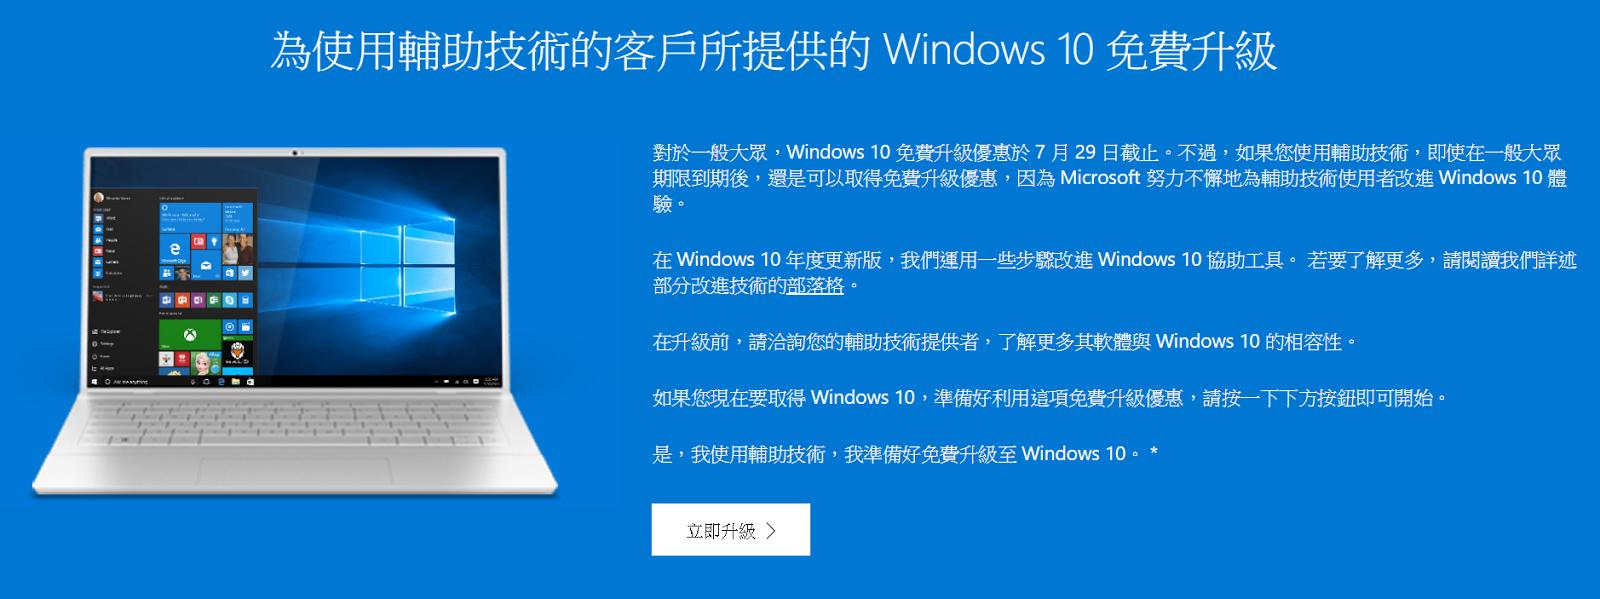 Image%2B010 - [實測] Win7/Win8/Win8.1免費升級至Win10,超簡單免用USB、光碟機!